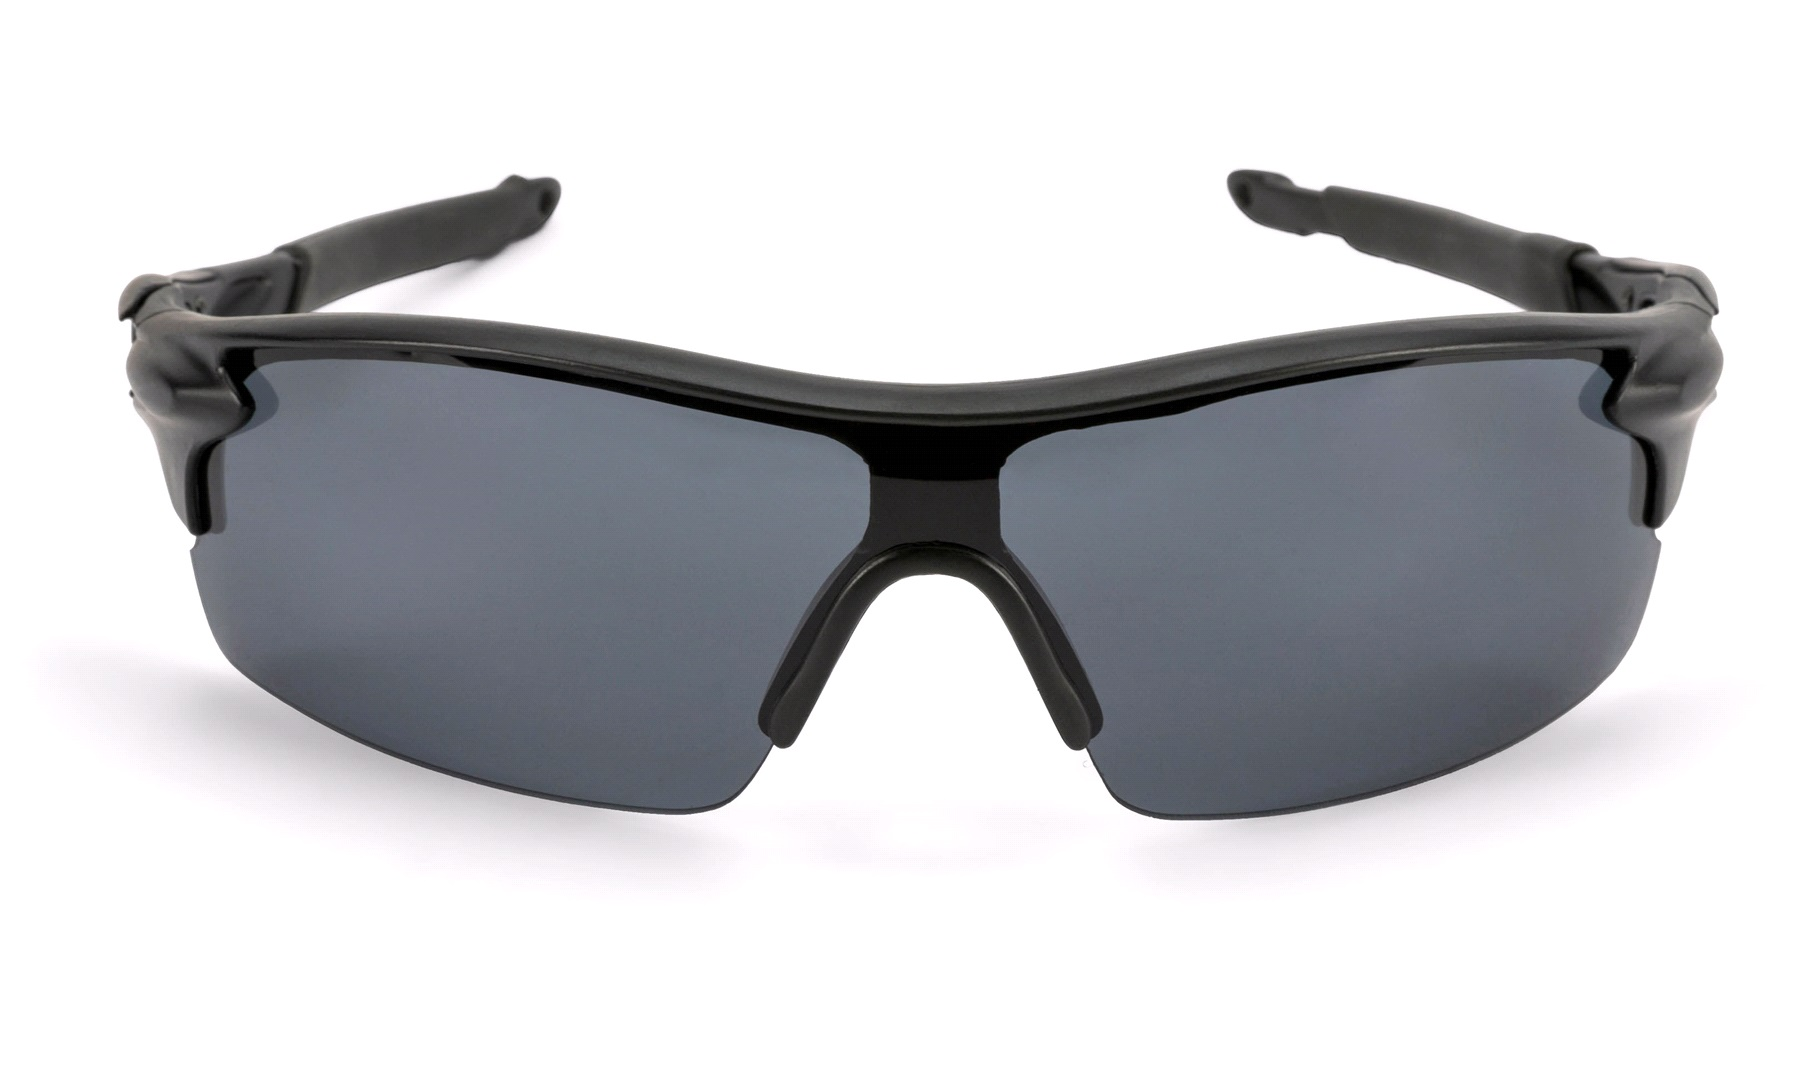 Sportsbrille helglas mat sort mgrå glas Briller thansen.dk